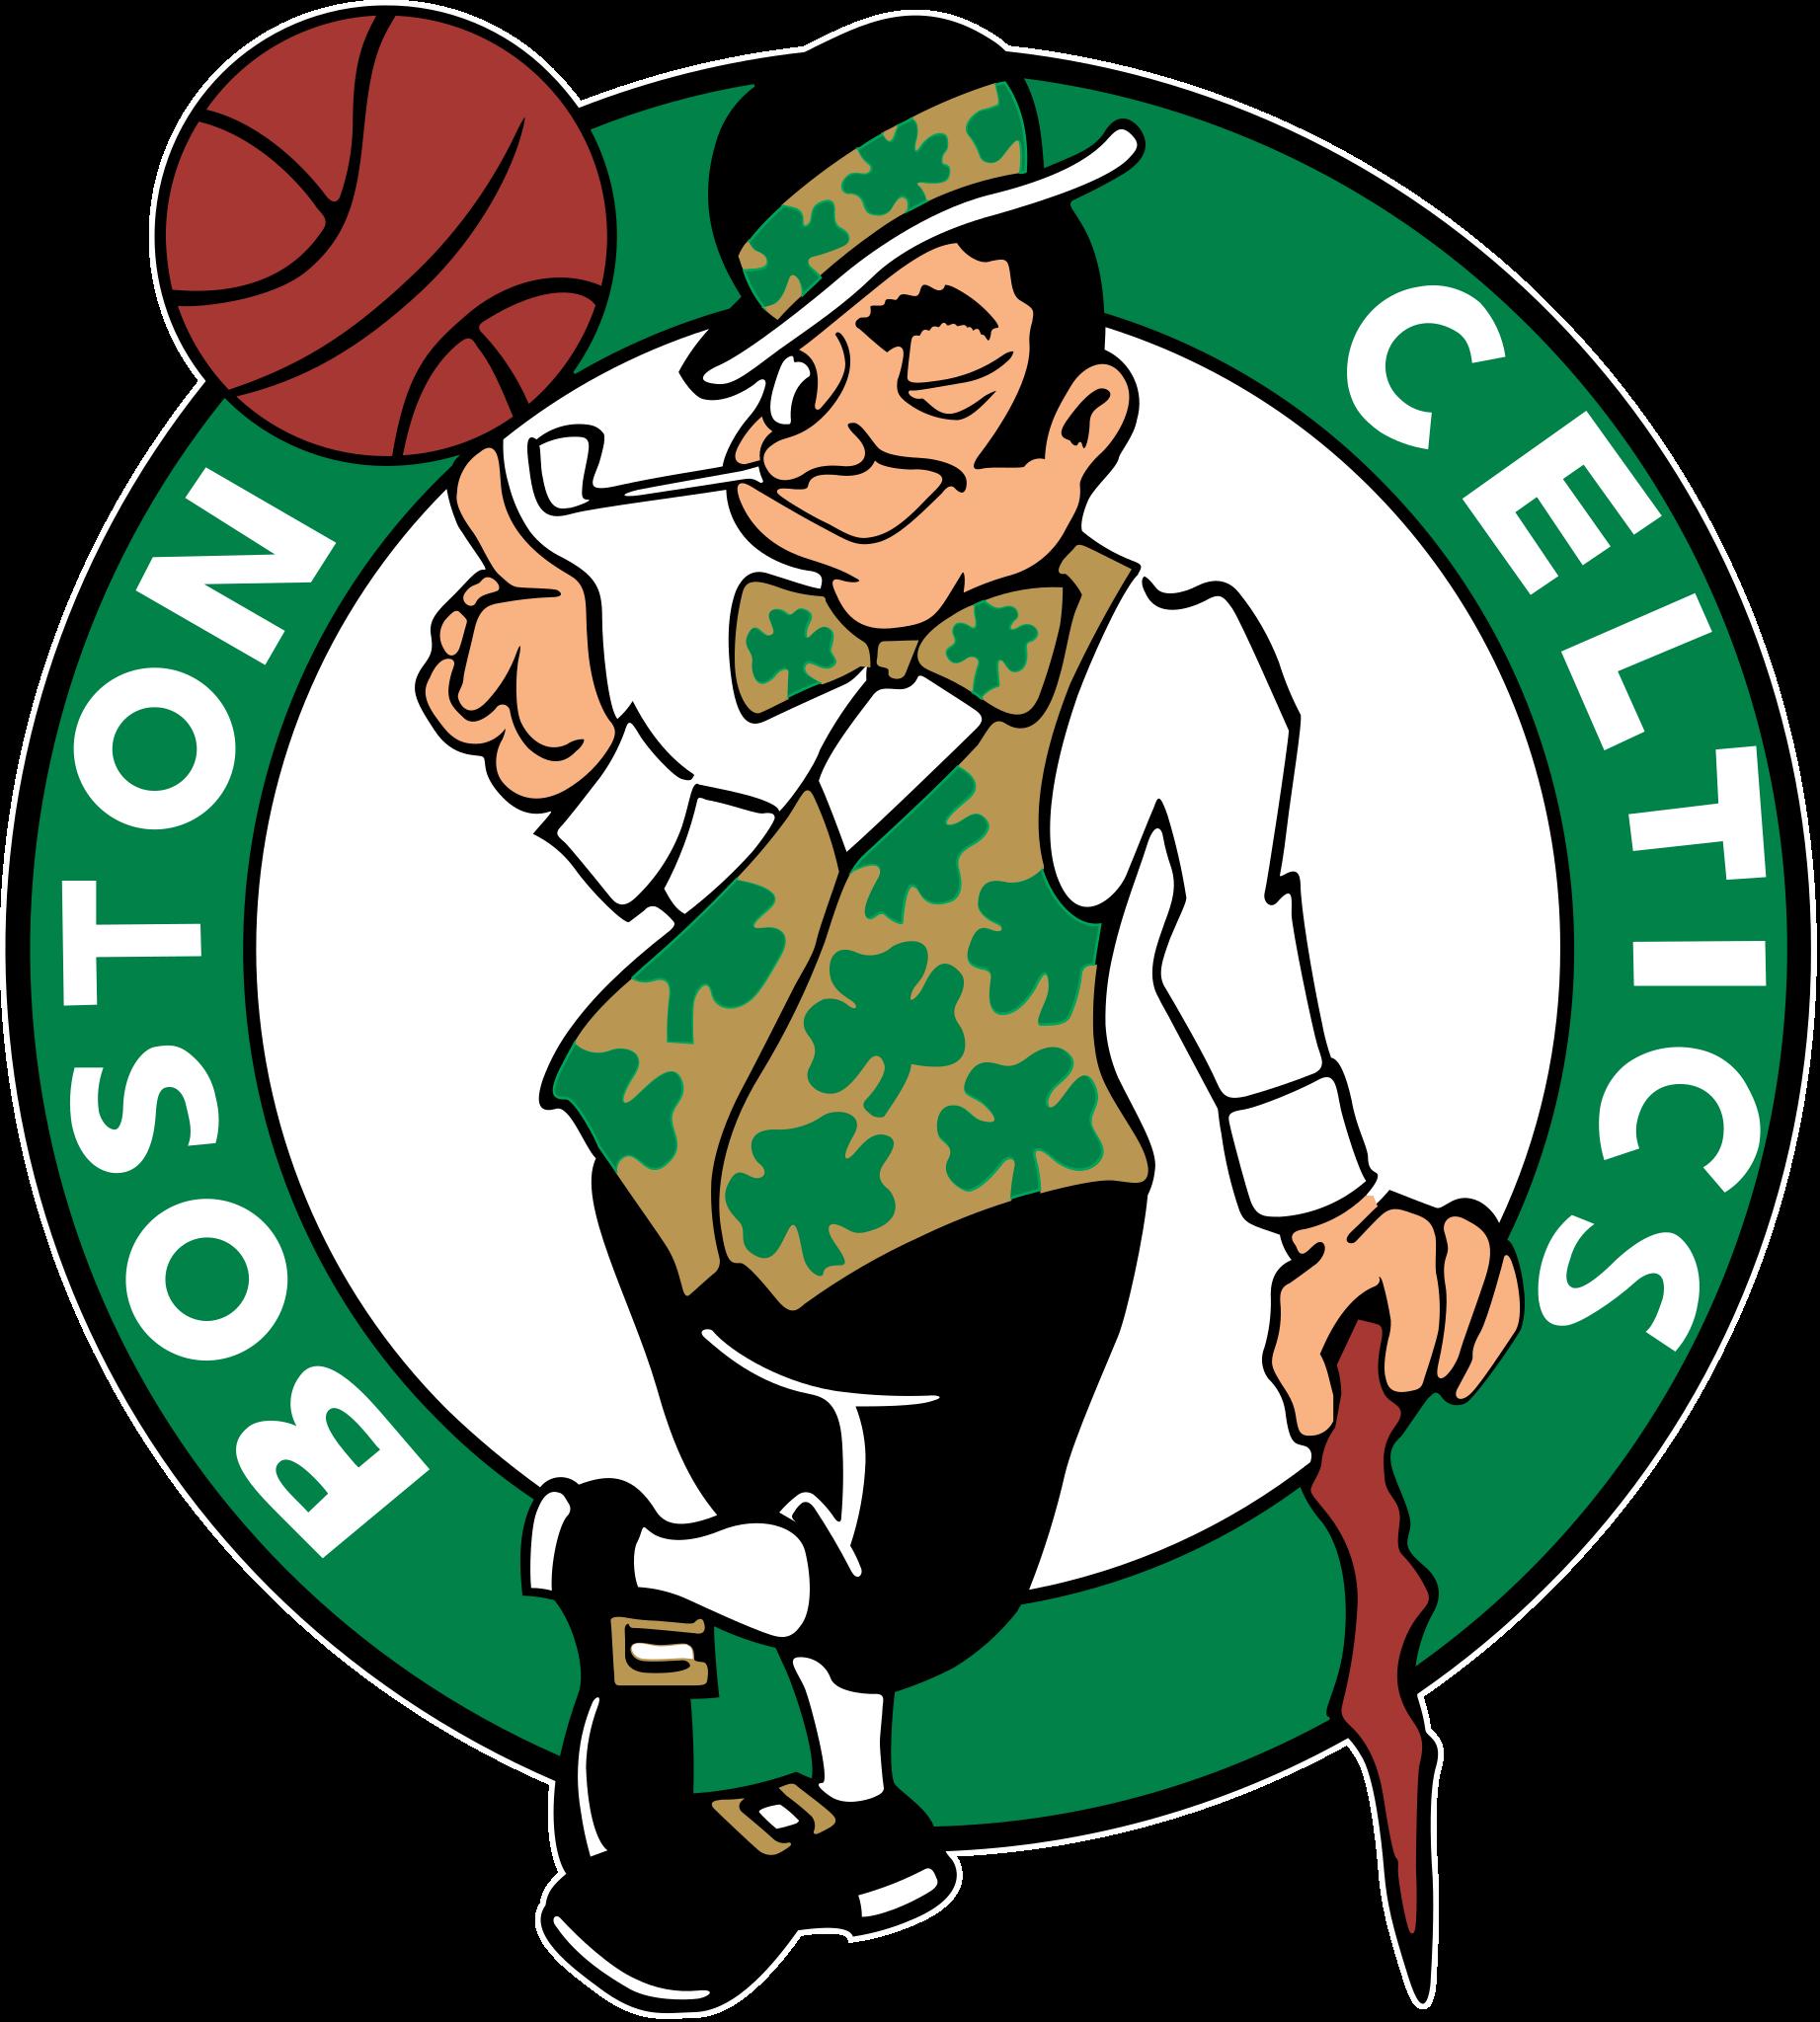 BostonCelticsLogo